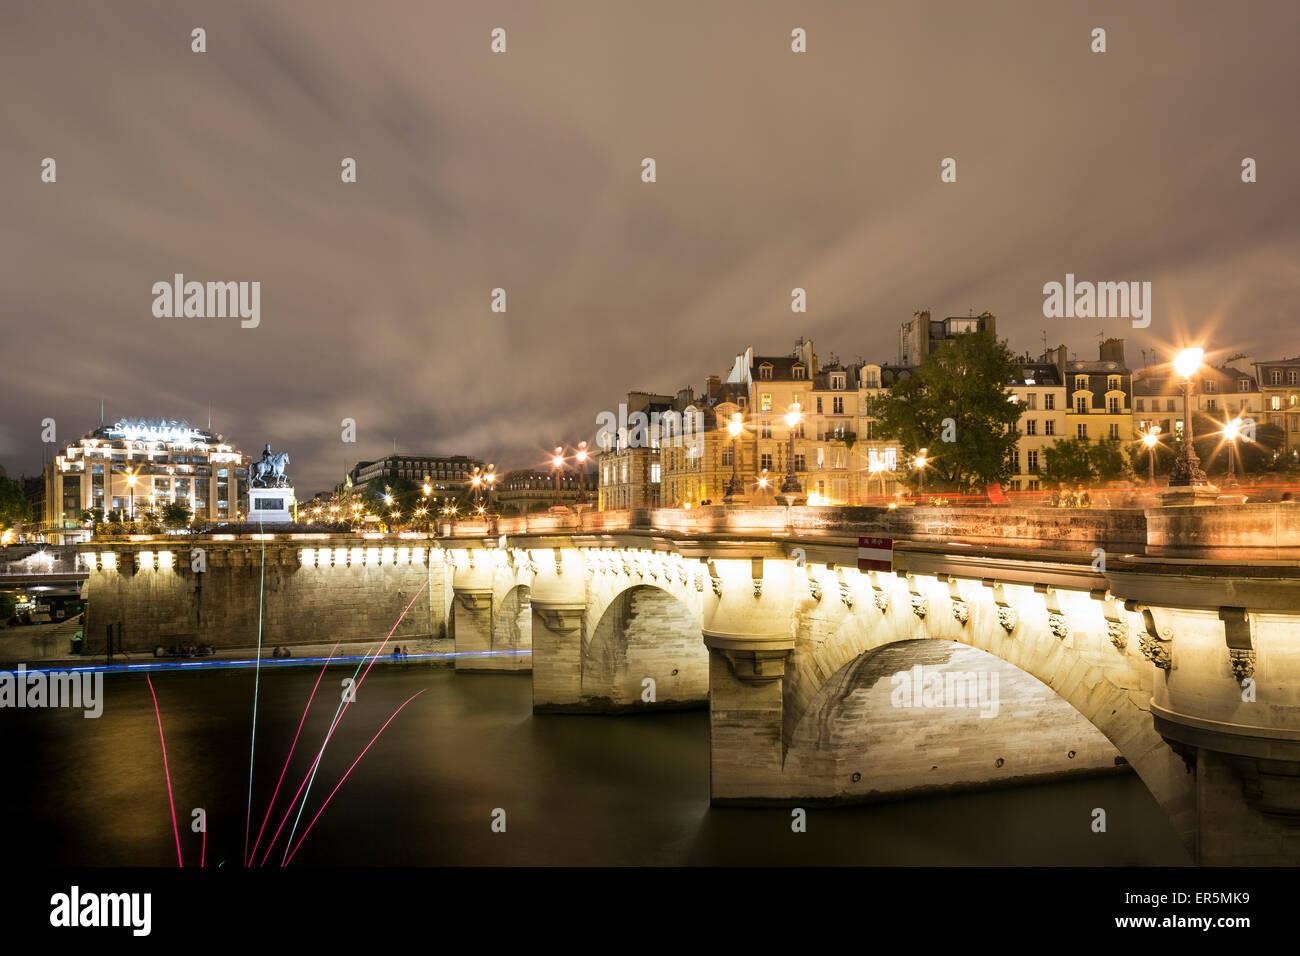 Pont Neuf in the evening light, Ile de la Cite, Paris, France, Europe, UNESCO World Heritage Sites banks of Seine - Stock Image